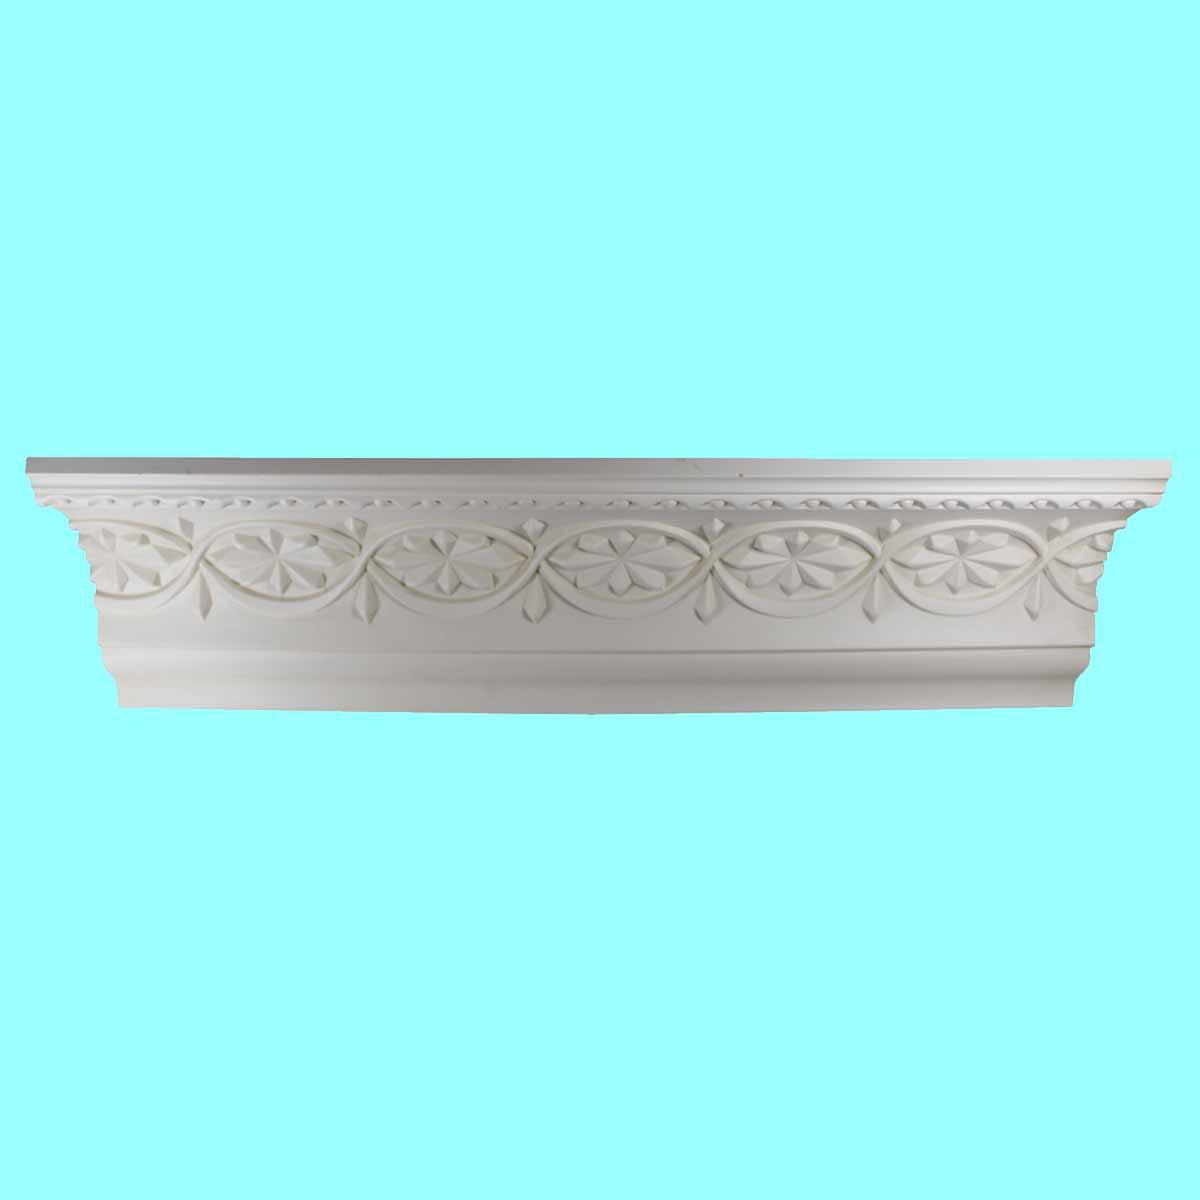 Cornice White Urethane Sample of 10986 23.5 Long Cornice Cornice Moulding Cornice Molding